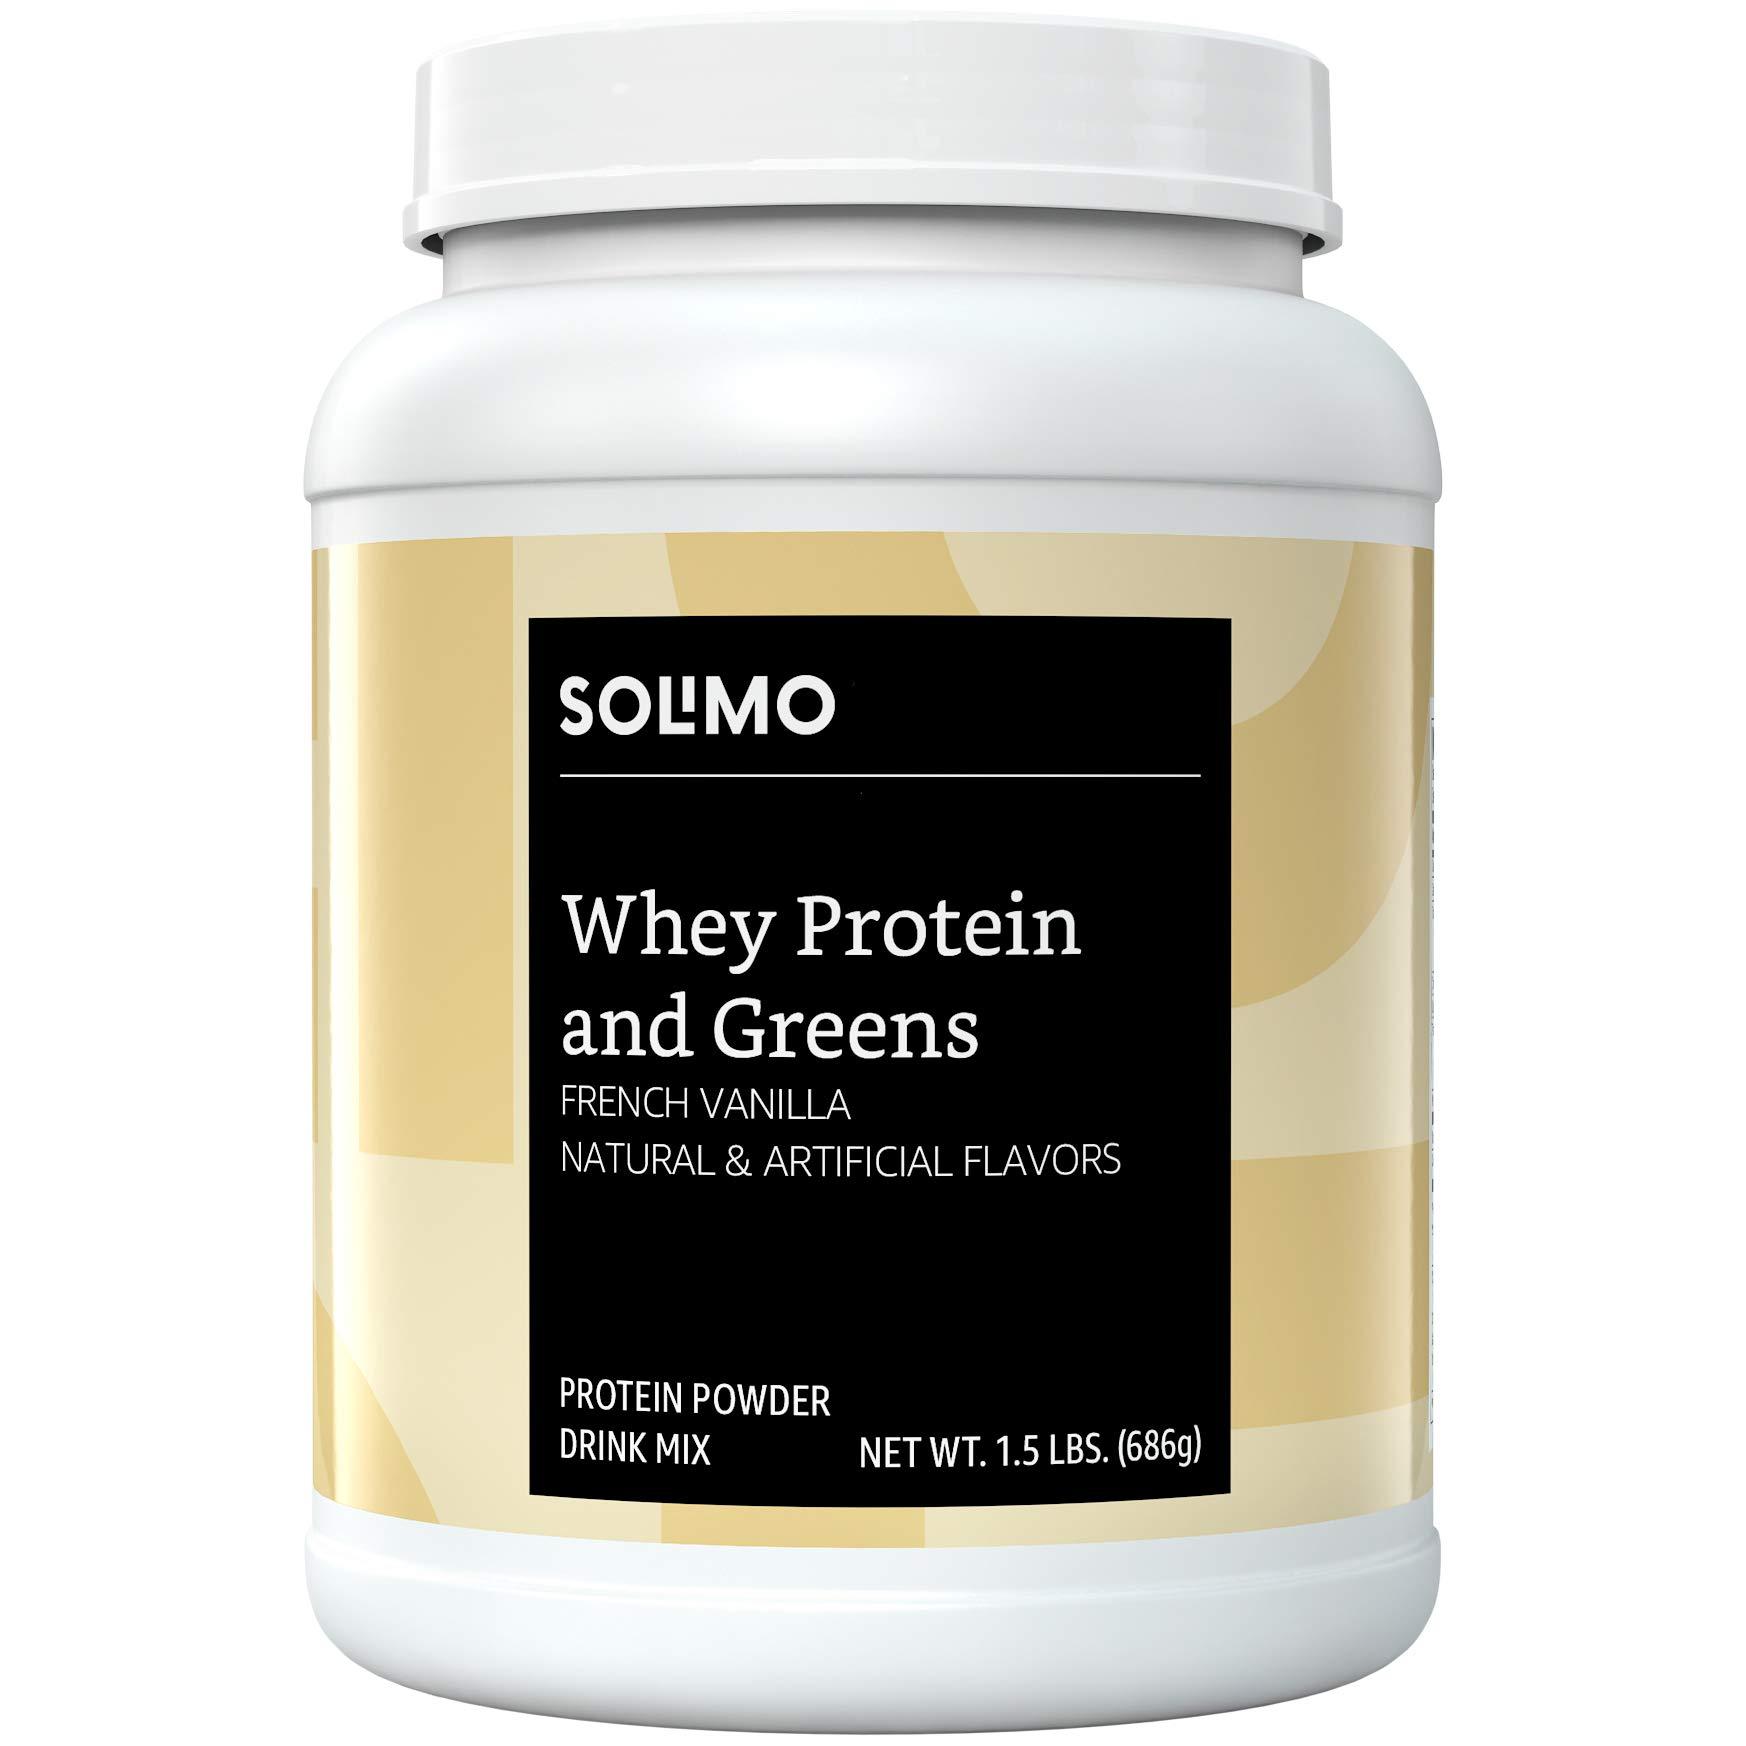 Amazon Brand - Solimo Whey Protein & Greens Blend, French Vanilla, 1.5 Pound